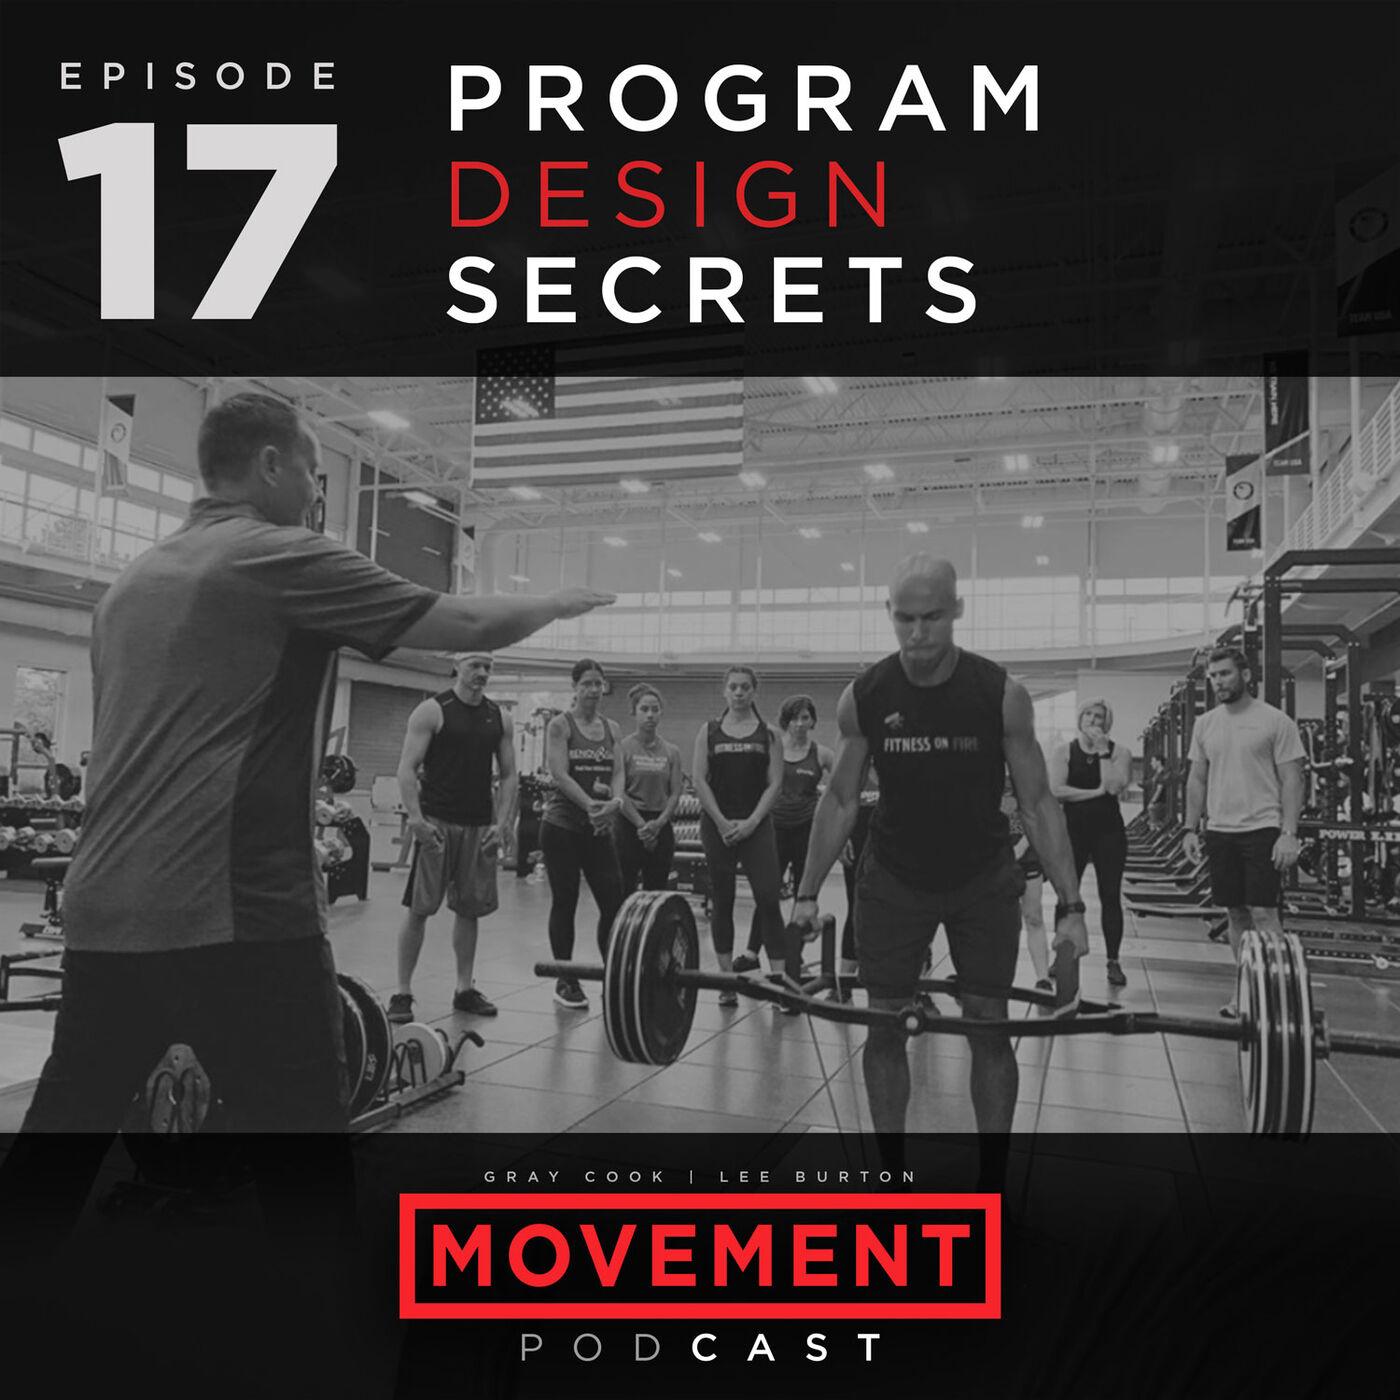 Program Design Secrets